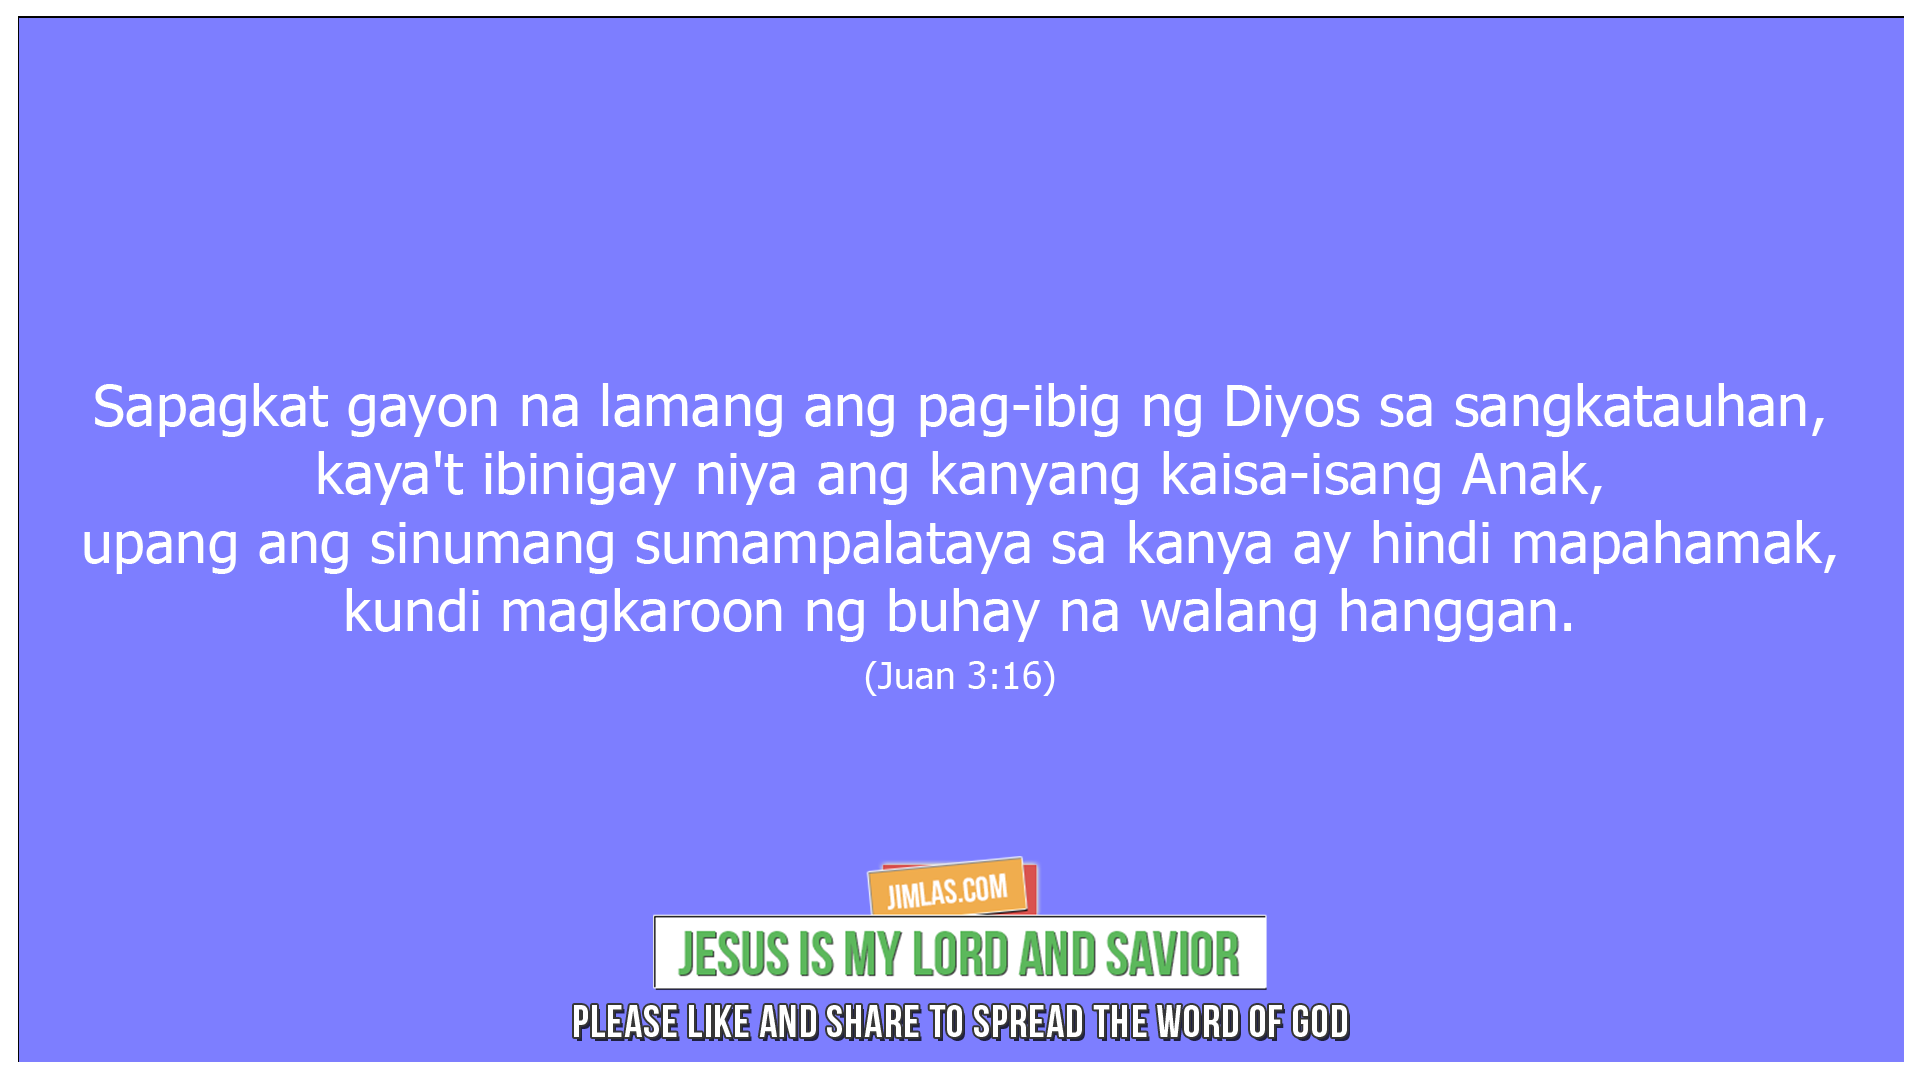 Juan 3 16, Juan 3:16